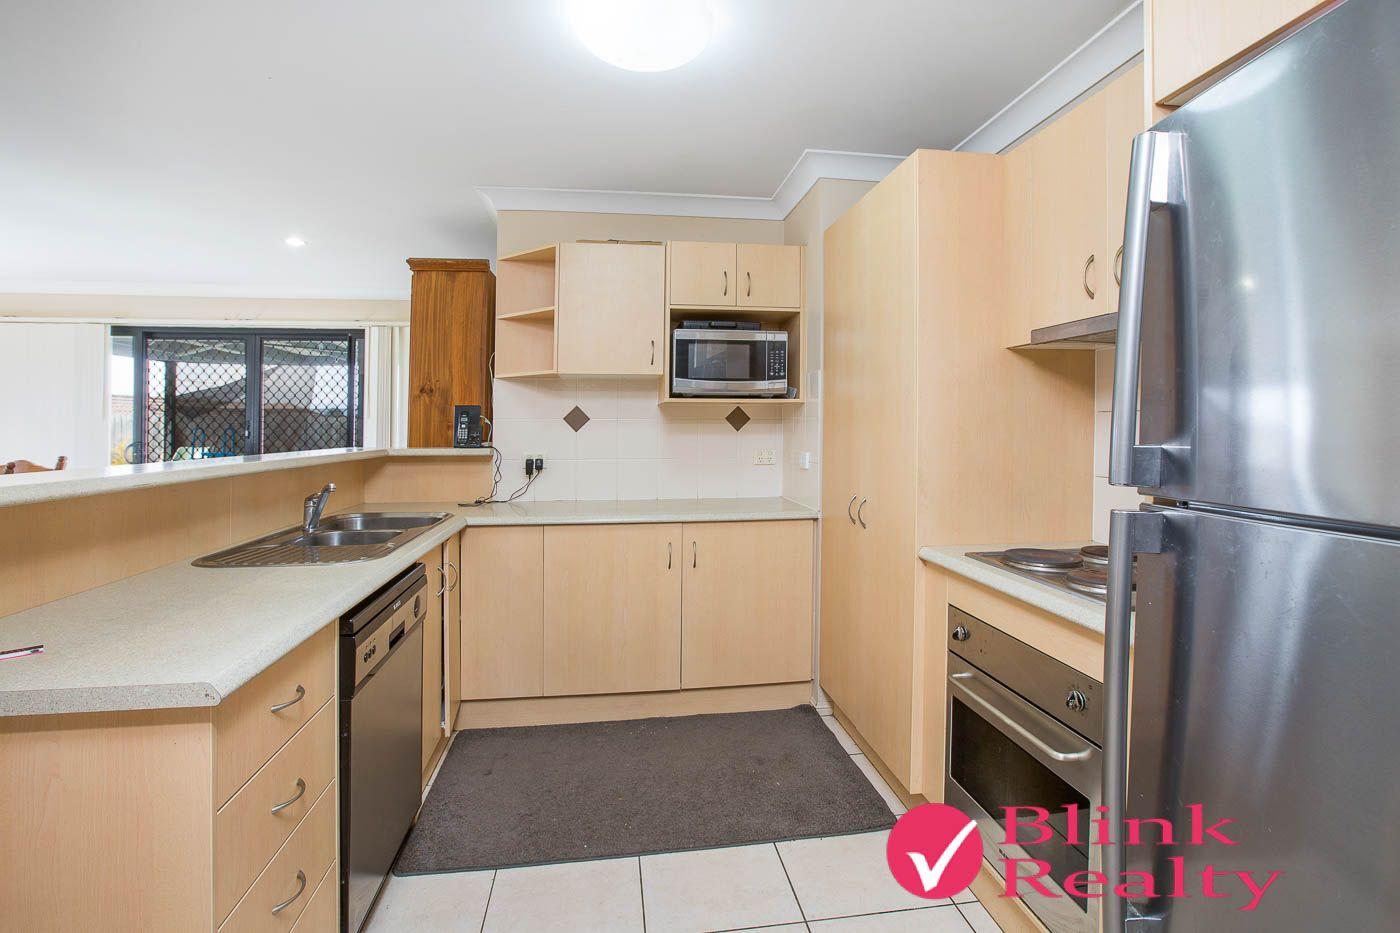 8 Hurst St, Crestmead QLD 4132, Image 1